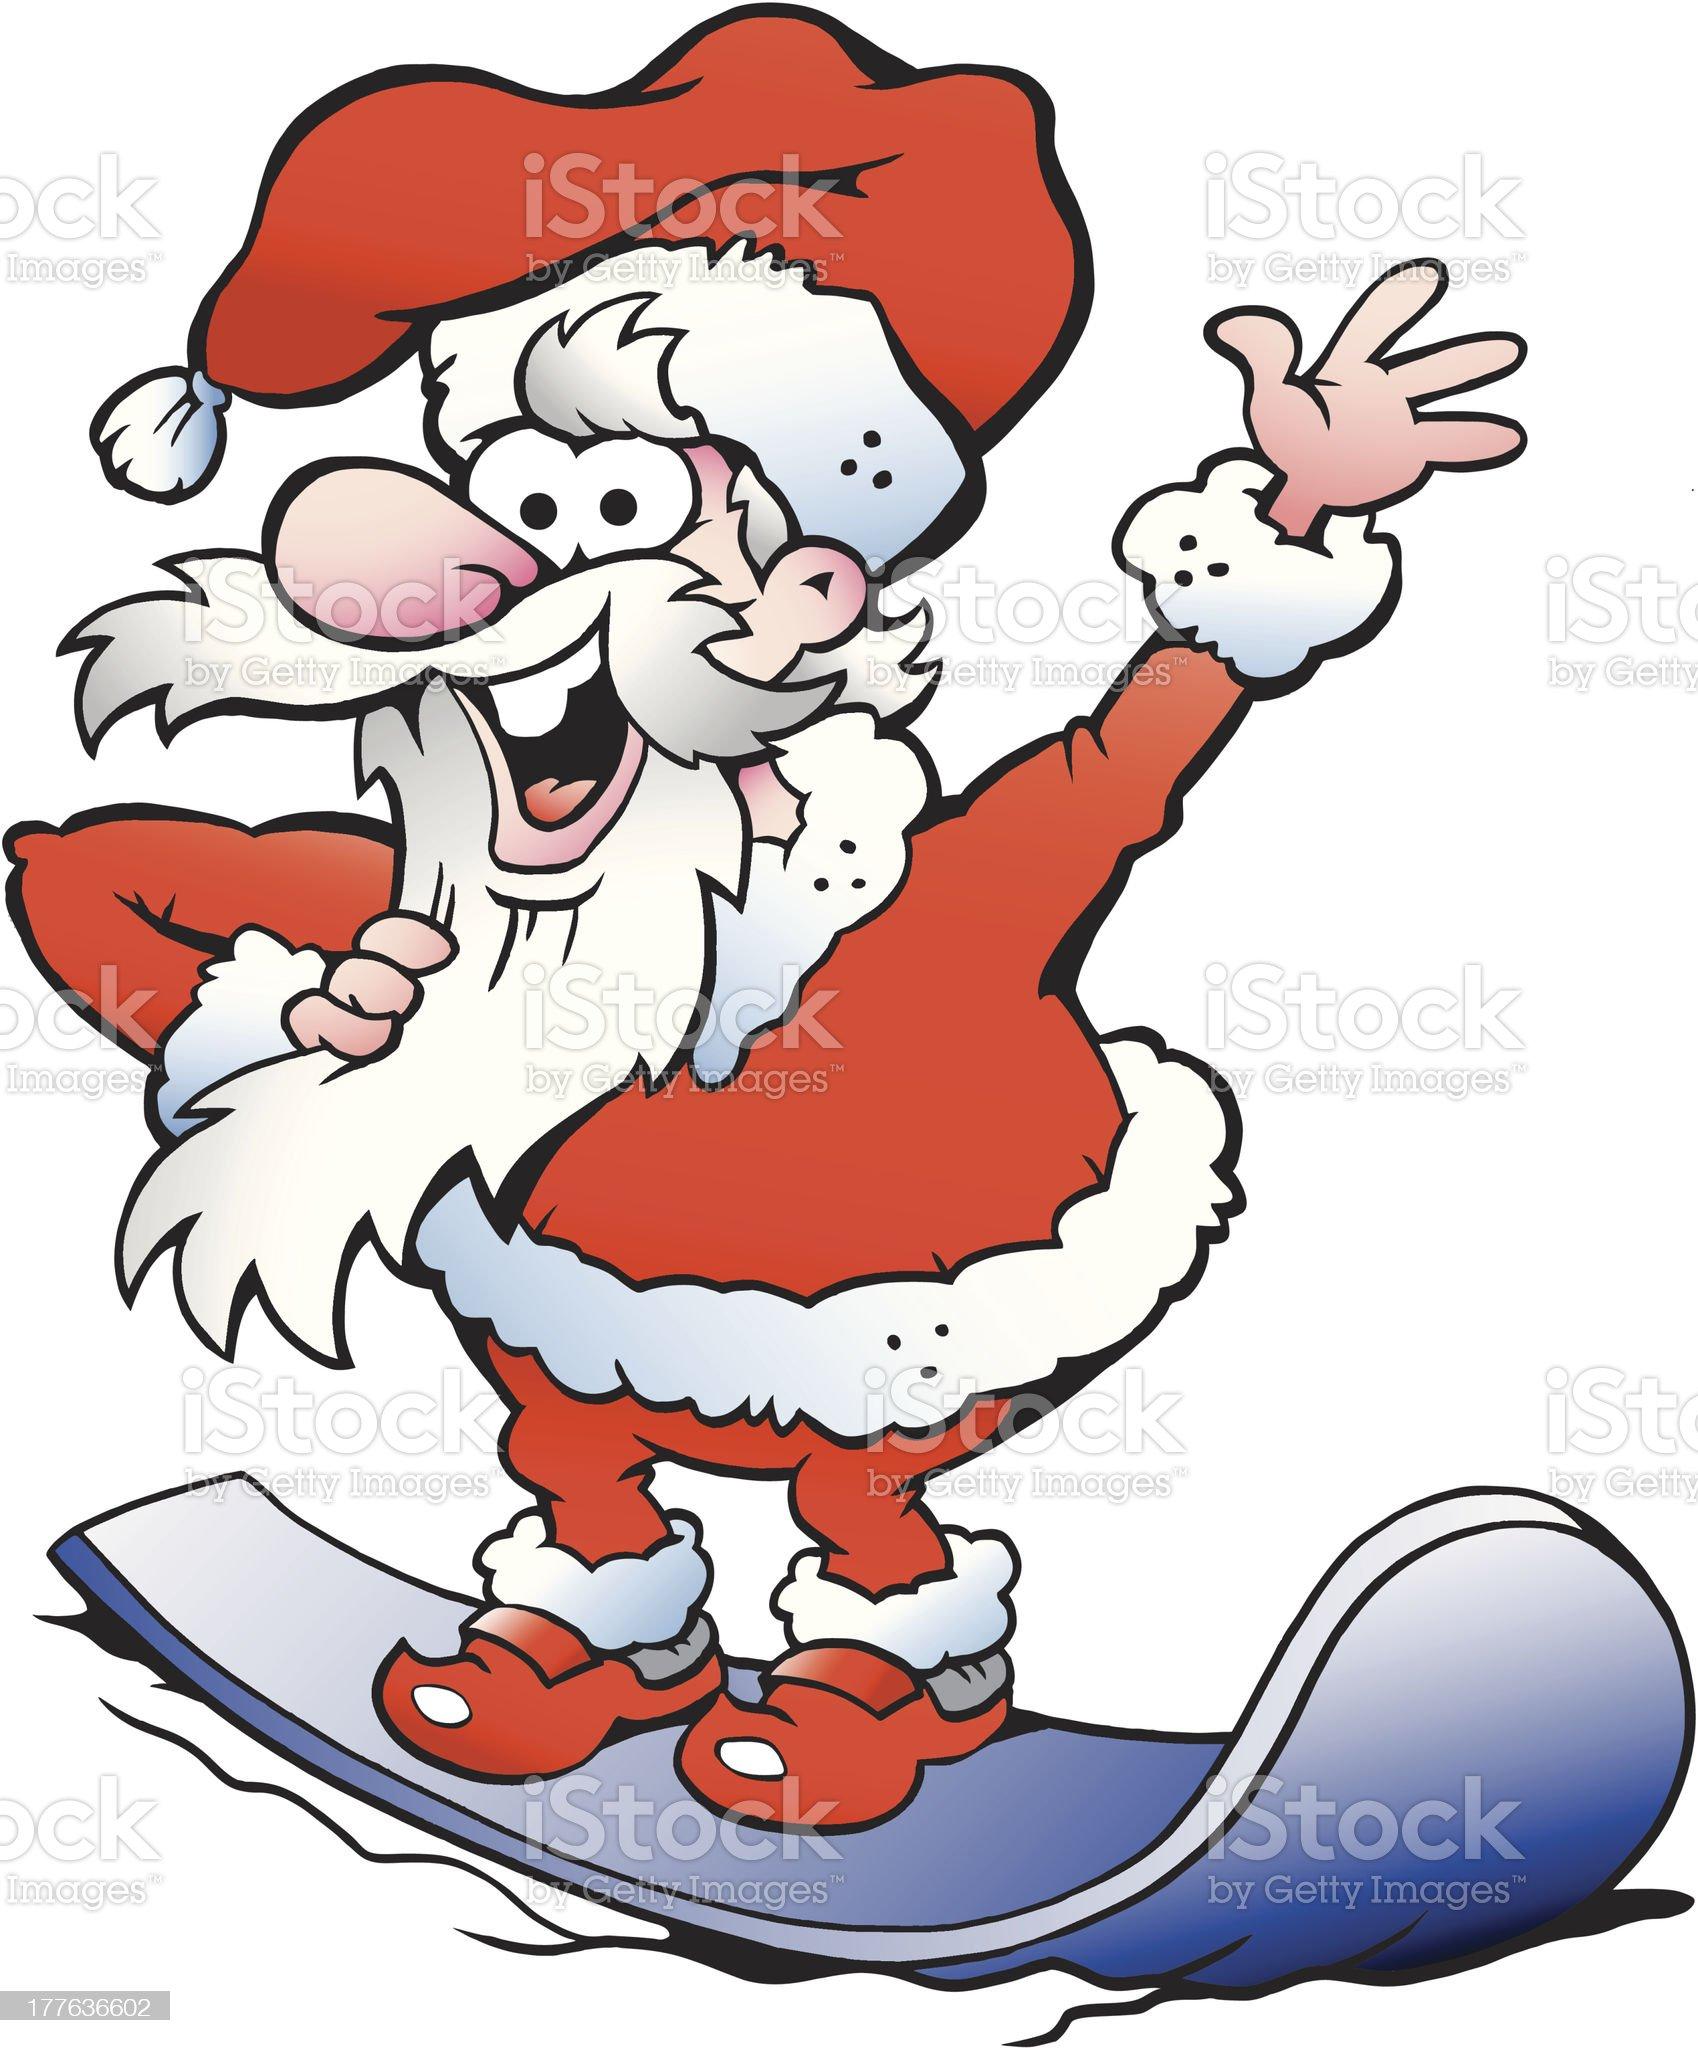 Illustration of an Happy Santa on snowboard royalty-free stock vector art